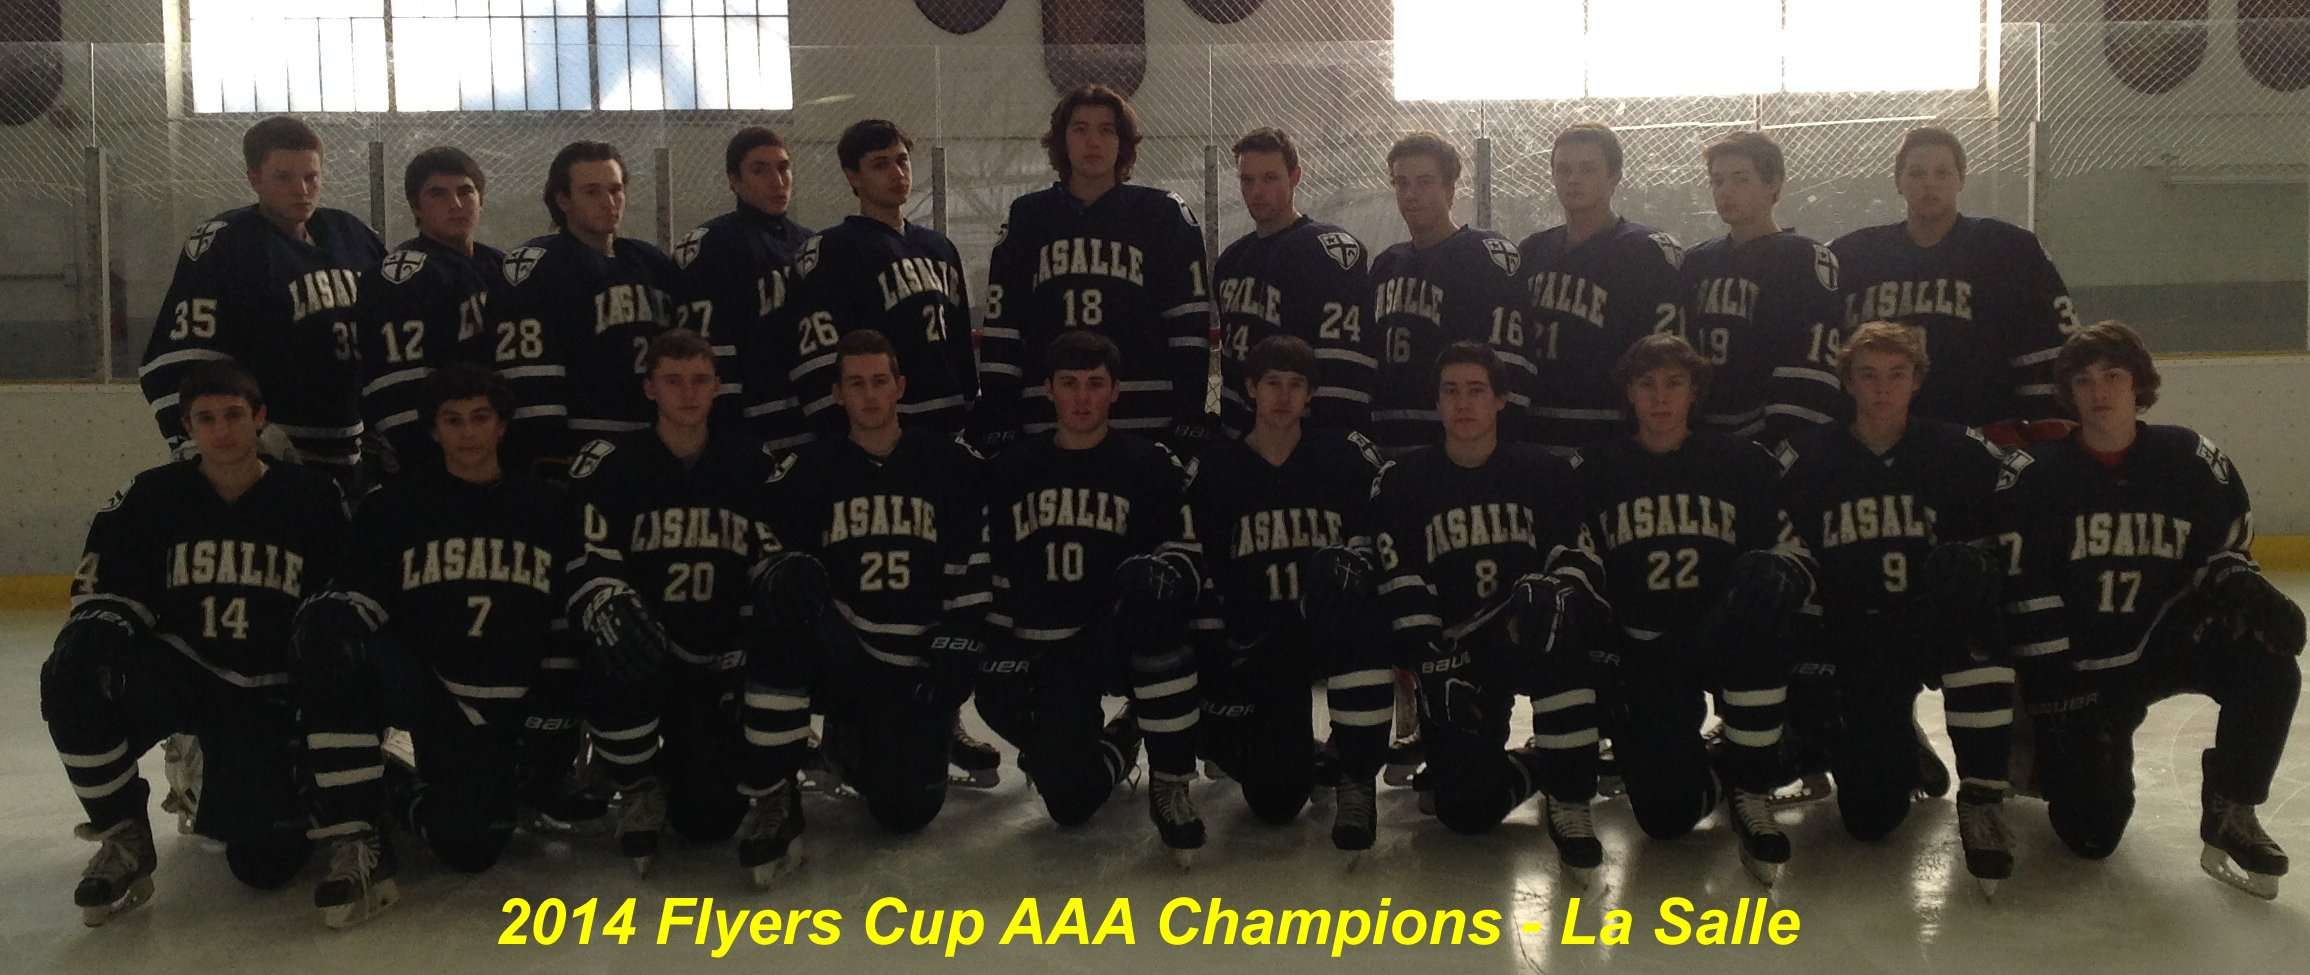 2014 Flyers Cup AAA LaSalle